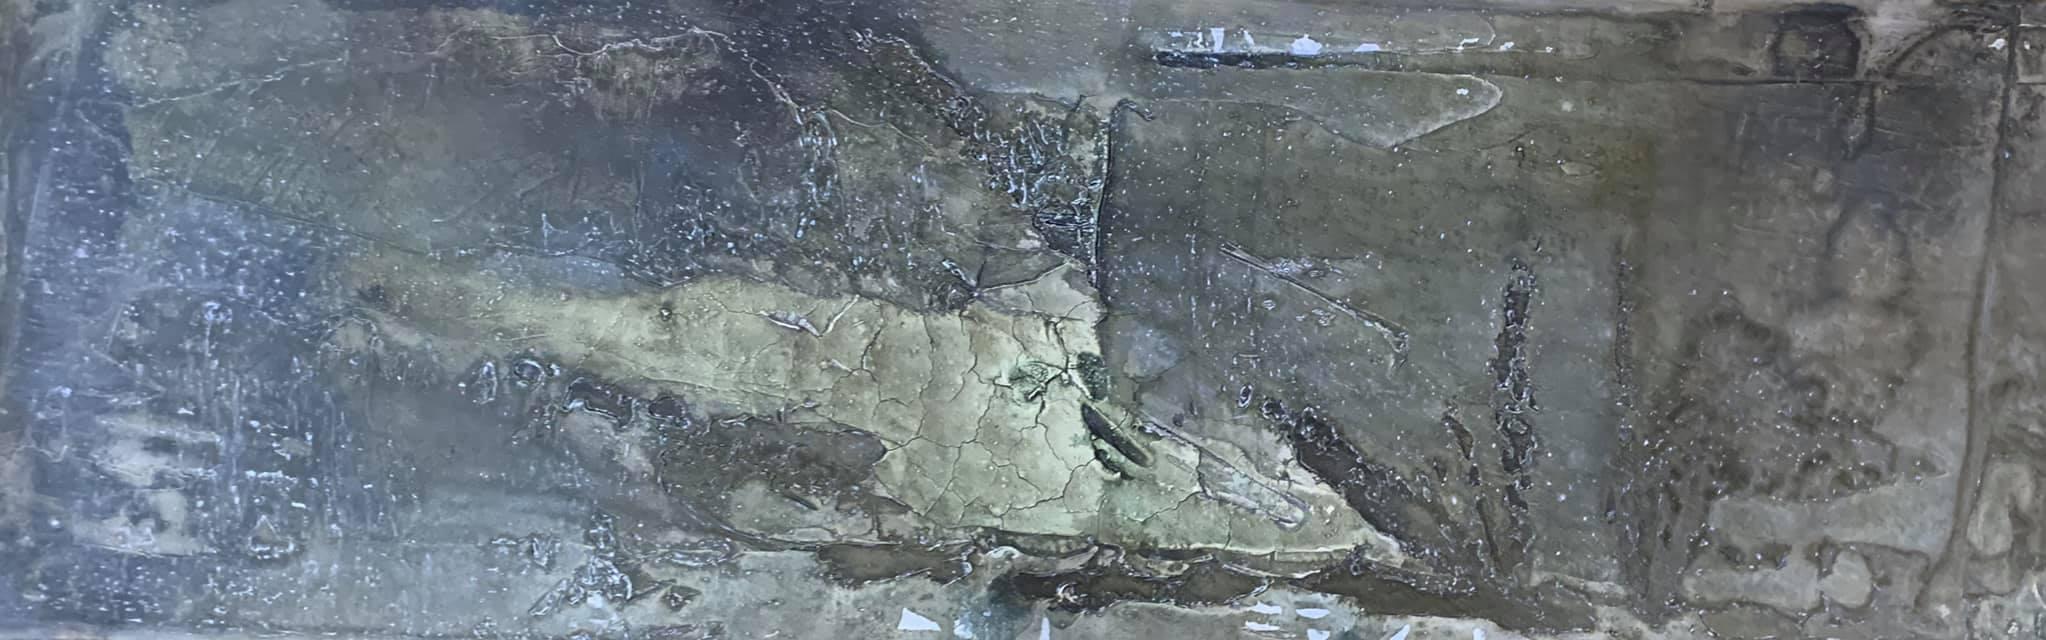 Fossil, 40cm x 1,20m x 4,5cm, Mixed Media,